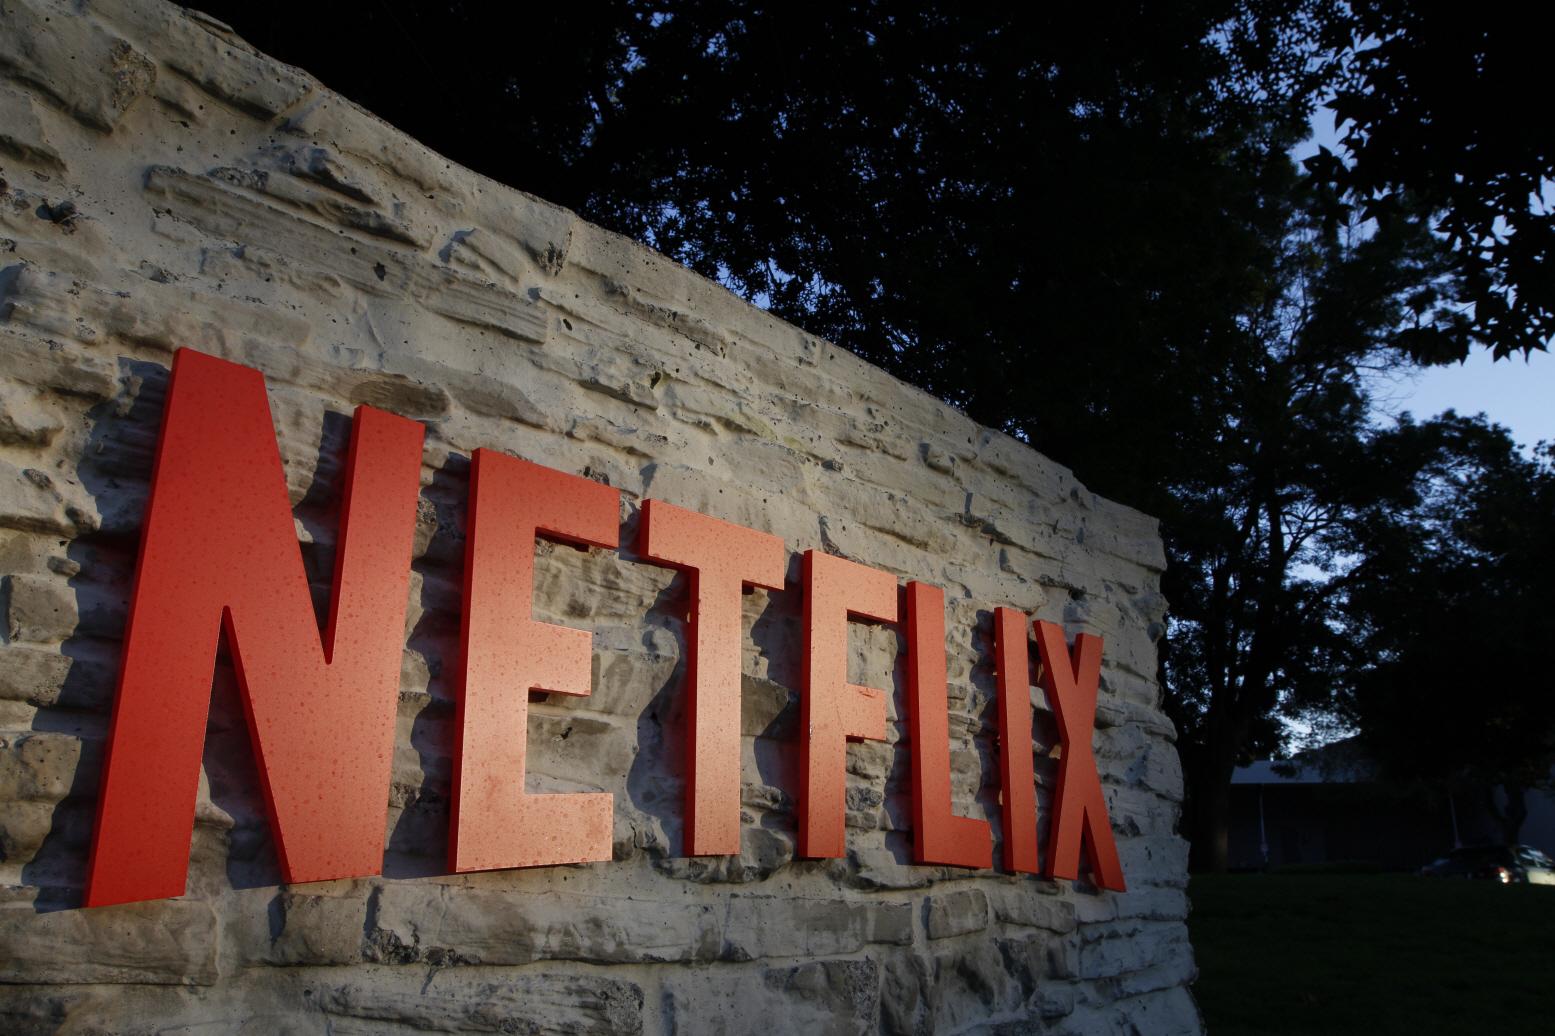 Os problemas legais de usar proxy para acessar o Netflix norte-americano